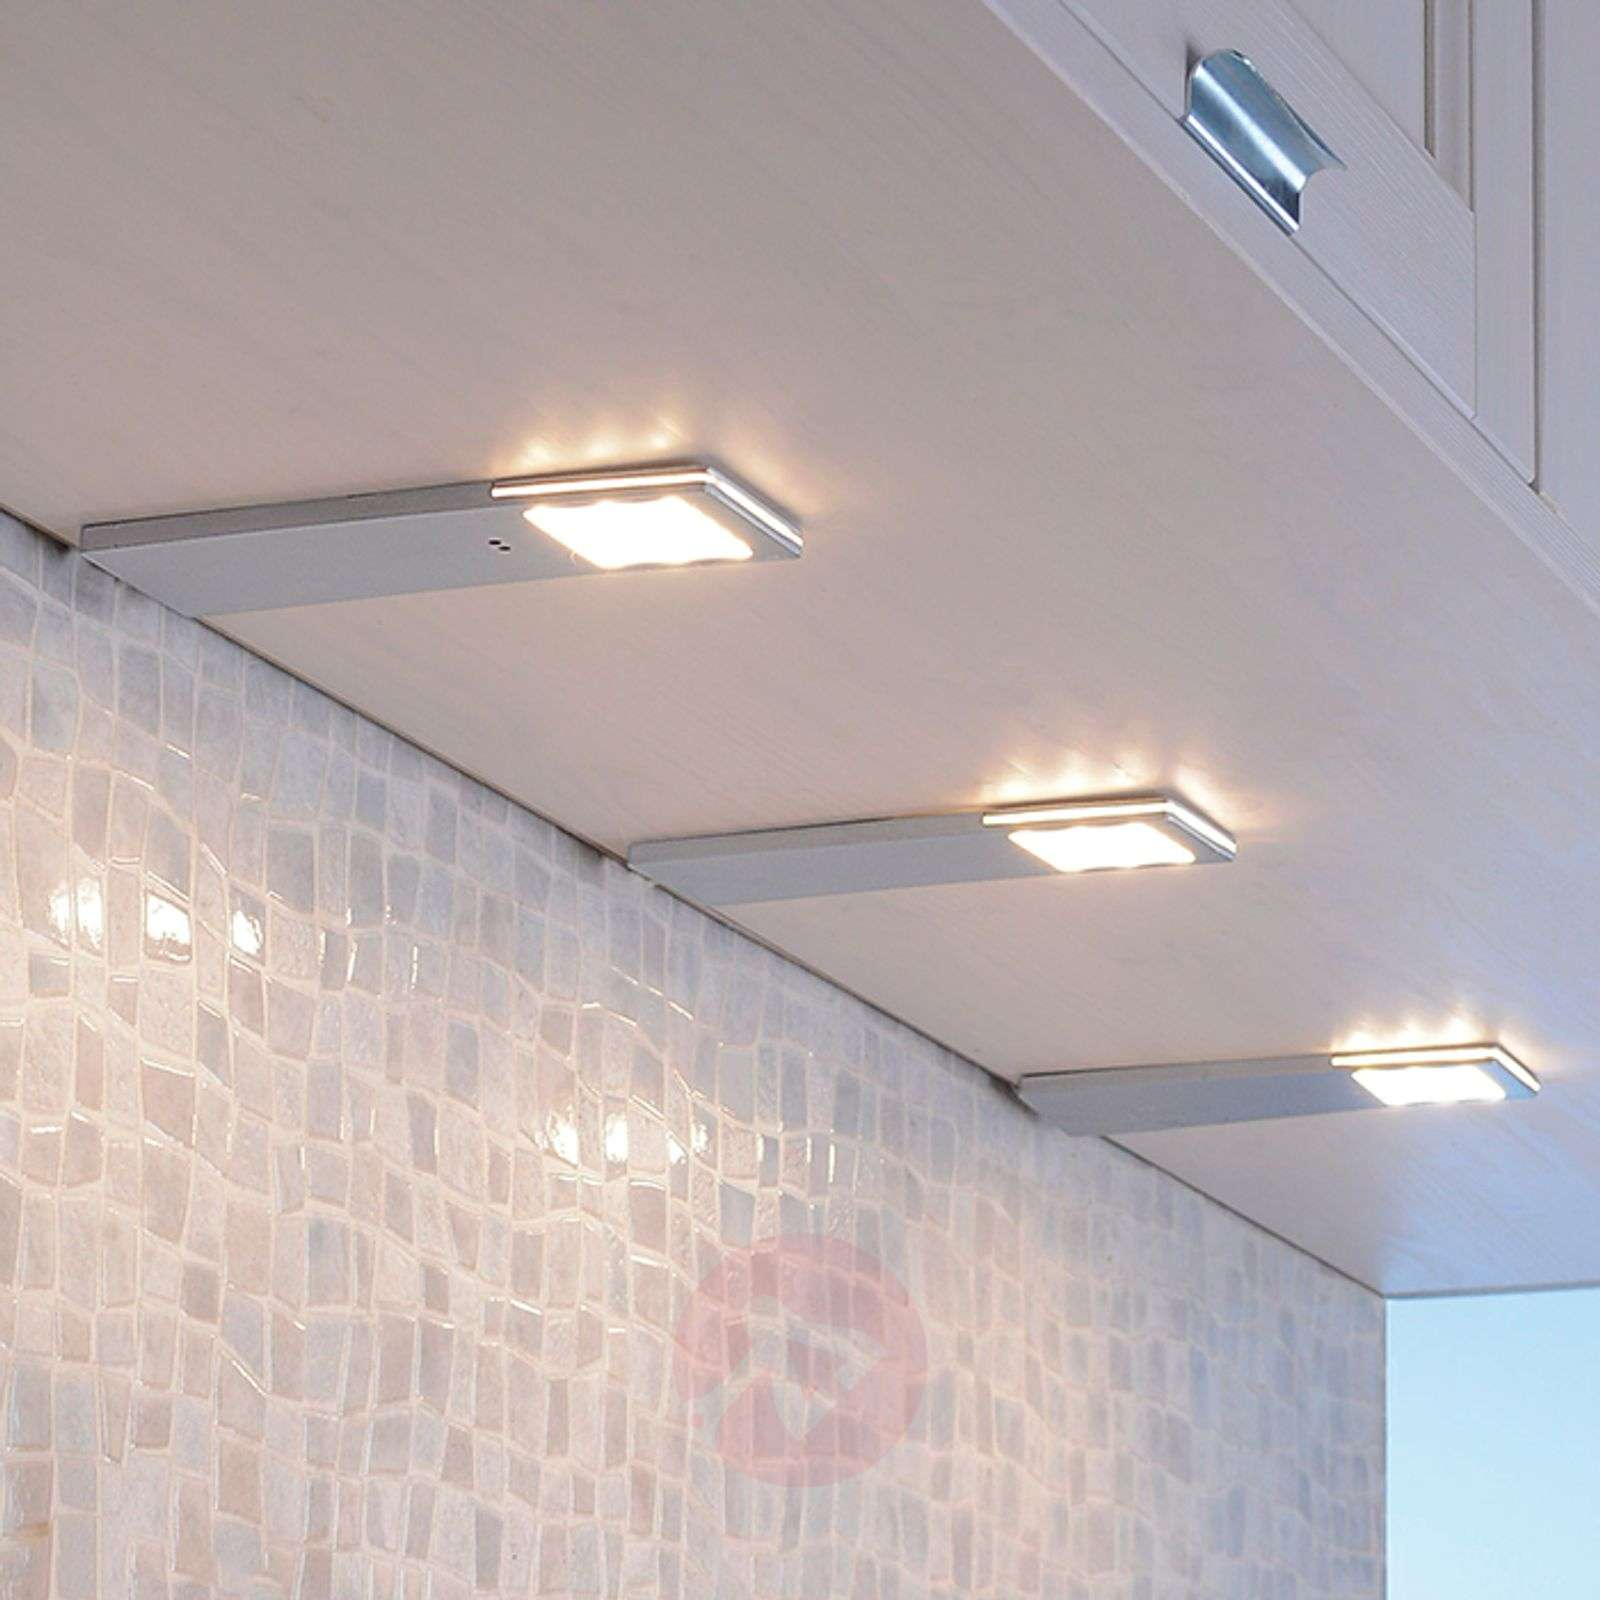 LED-kaapinalusvalo Helena 3:n setti 6,6 cm leveä-7610578-01